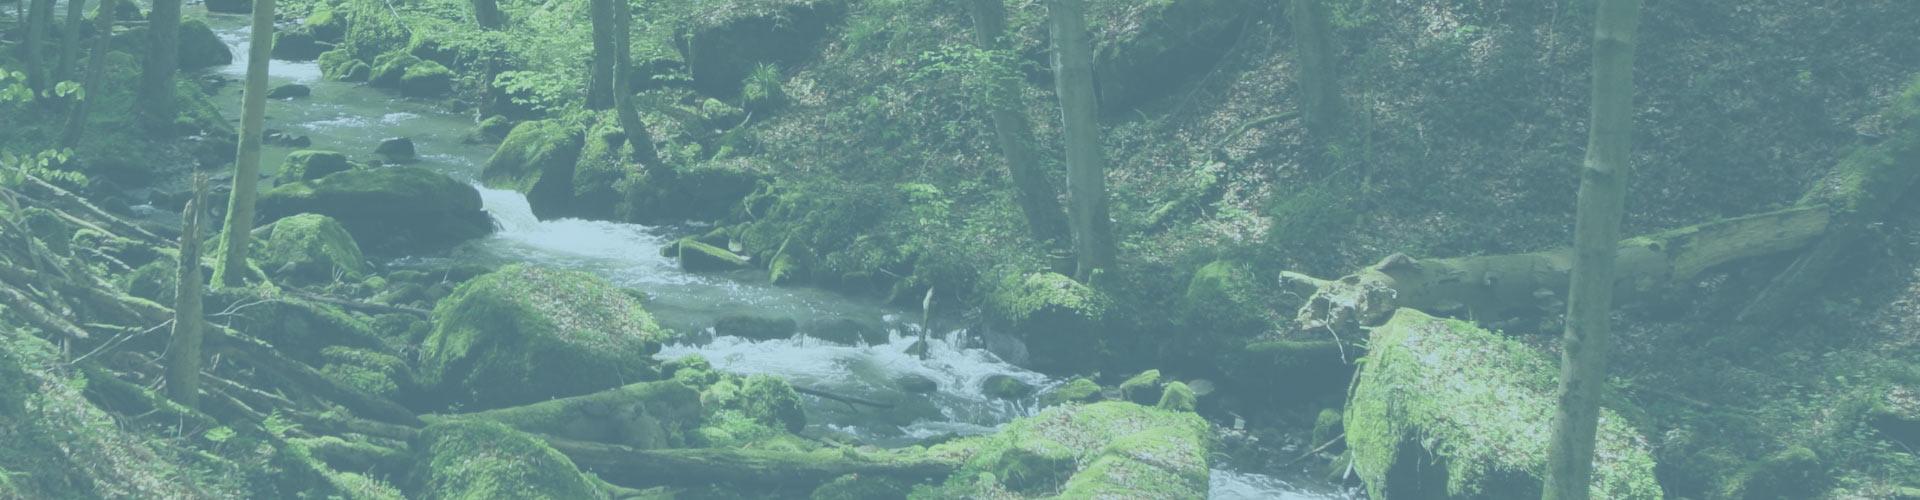 river-slide1-fade